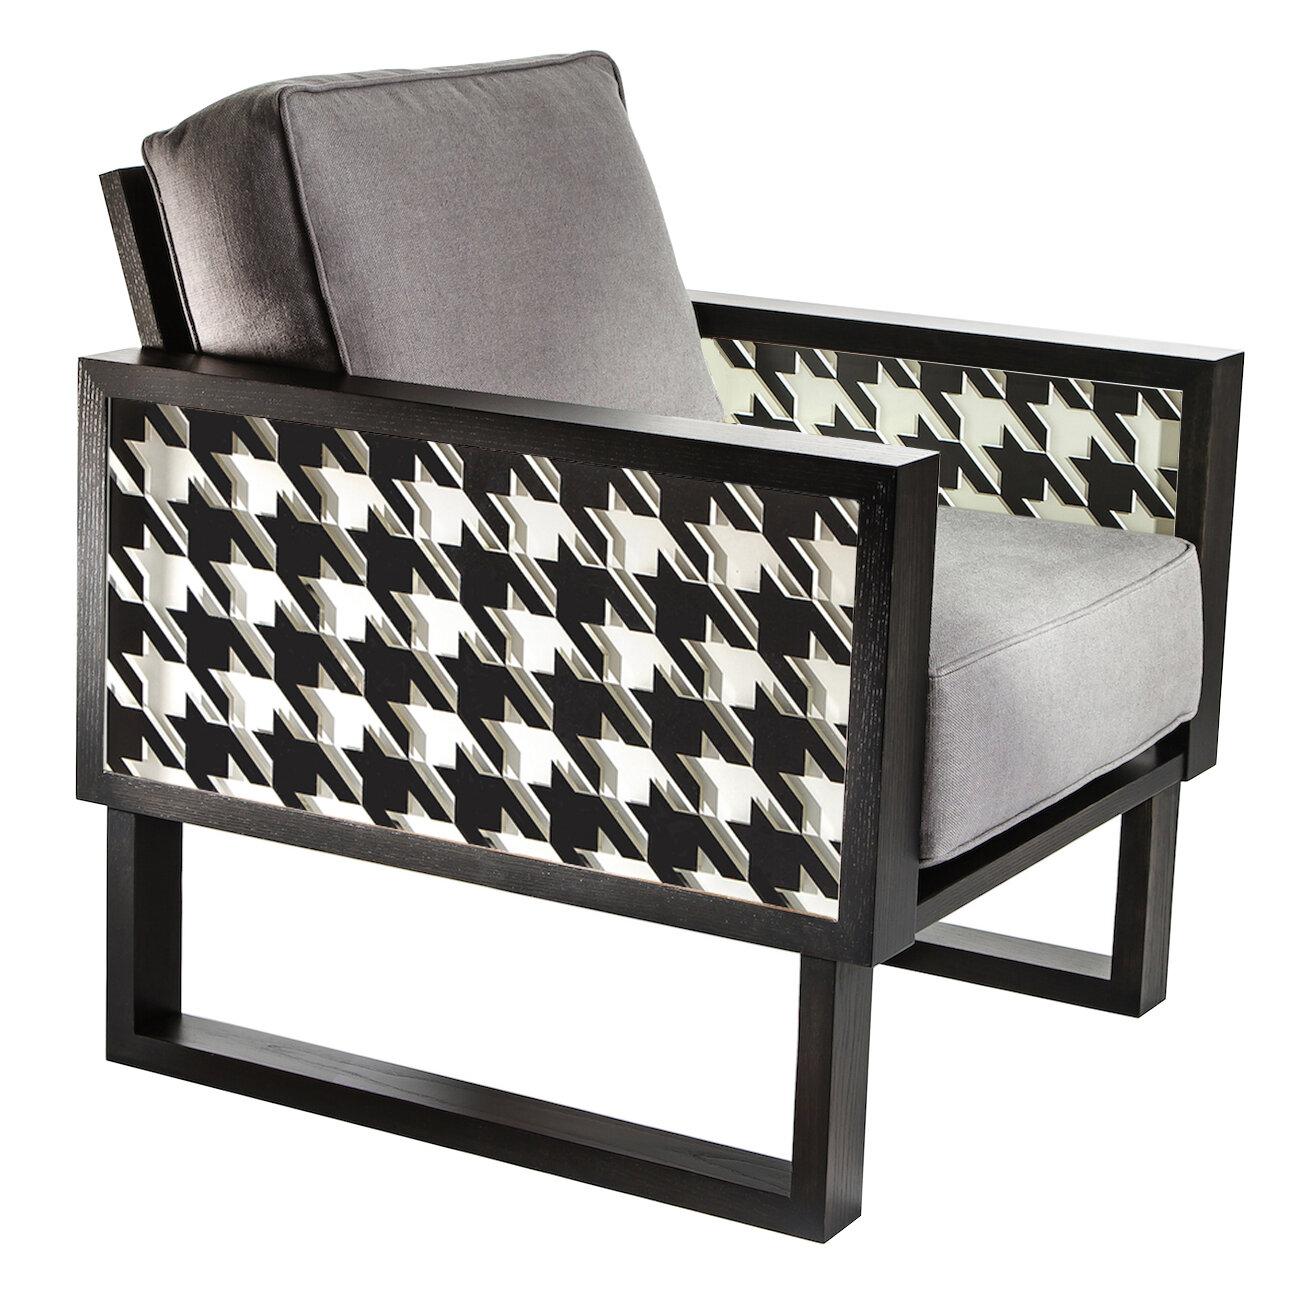 Stupendous Keppler Lounge Chair Gamerscity Chair Design For Home Gamerscityorg